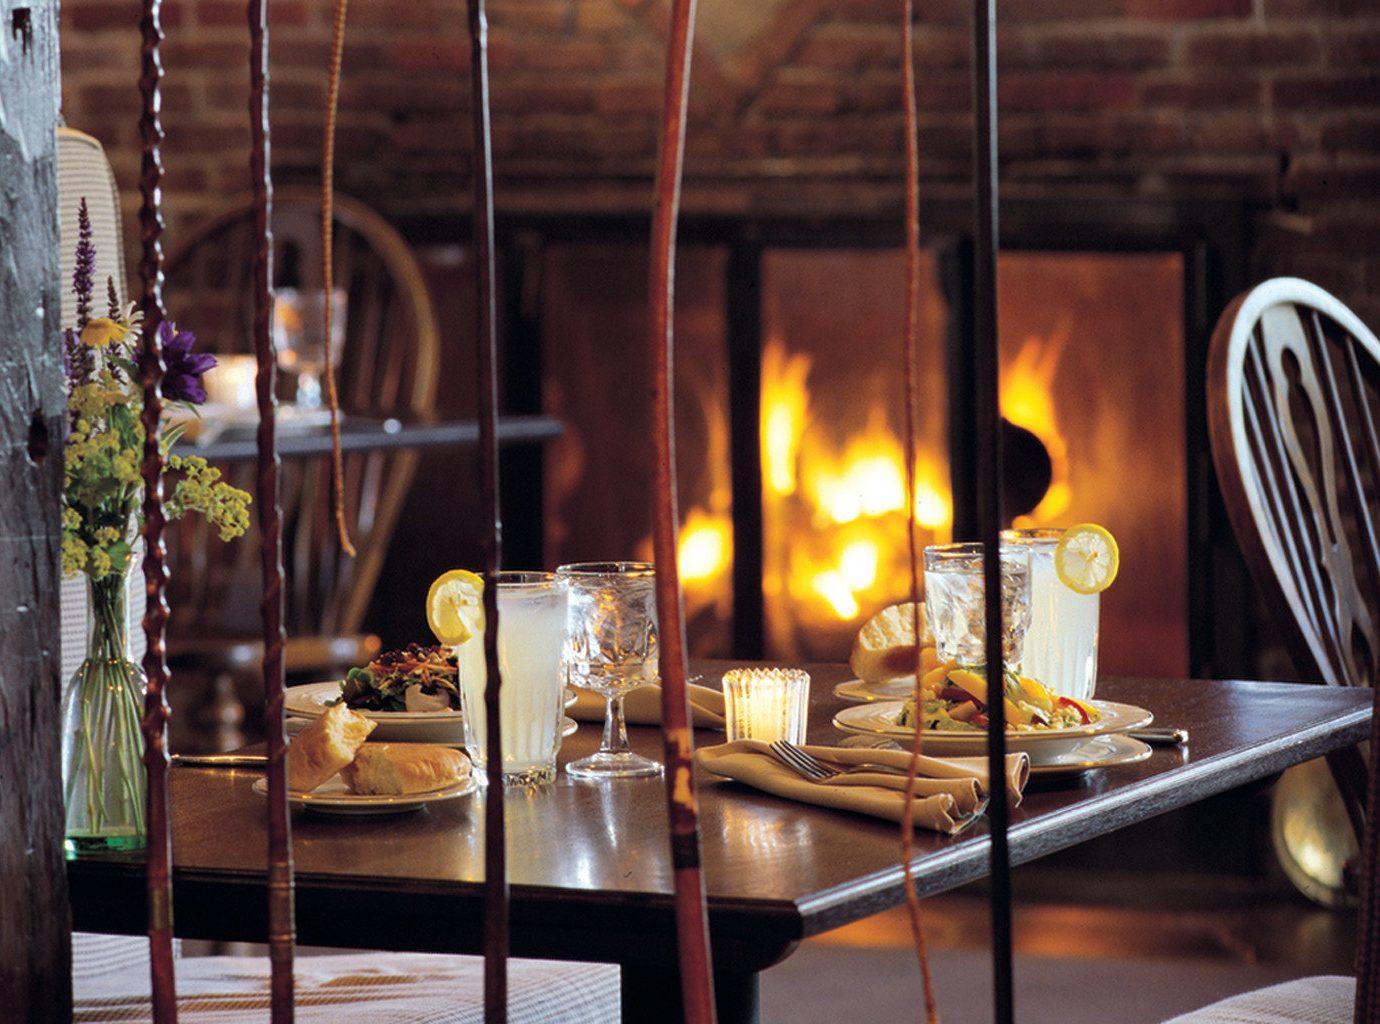 Bar Dining Drink Eat Fireplace Luxury restaurant lighting